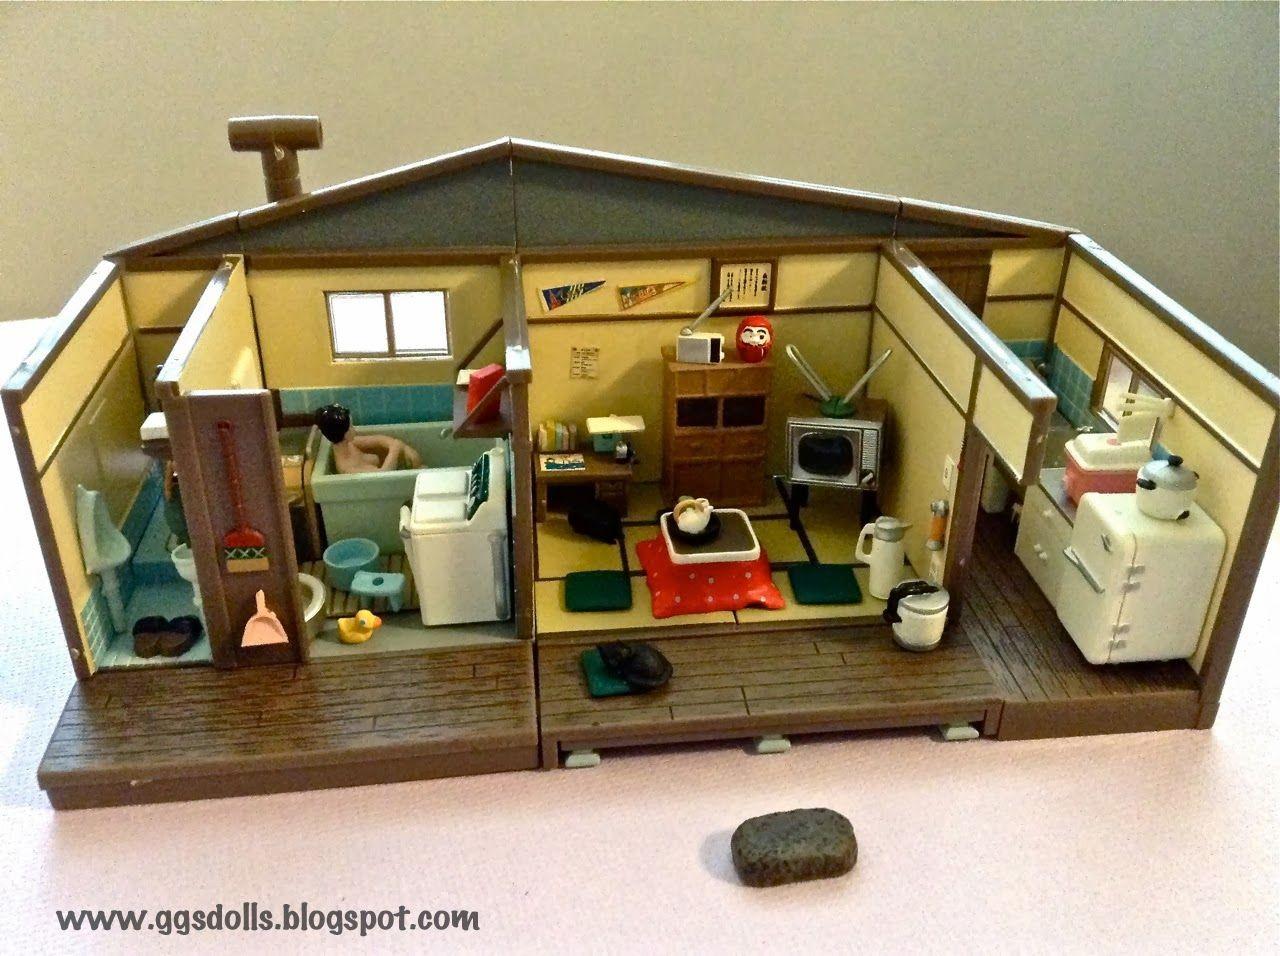 Papercraft Dollhouse Takara Miniature Retro Japanese Style House Easily to Build Plastic